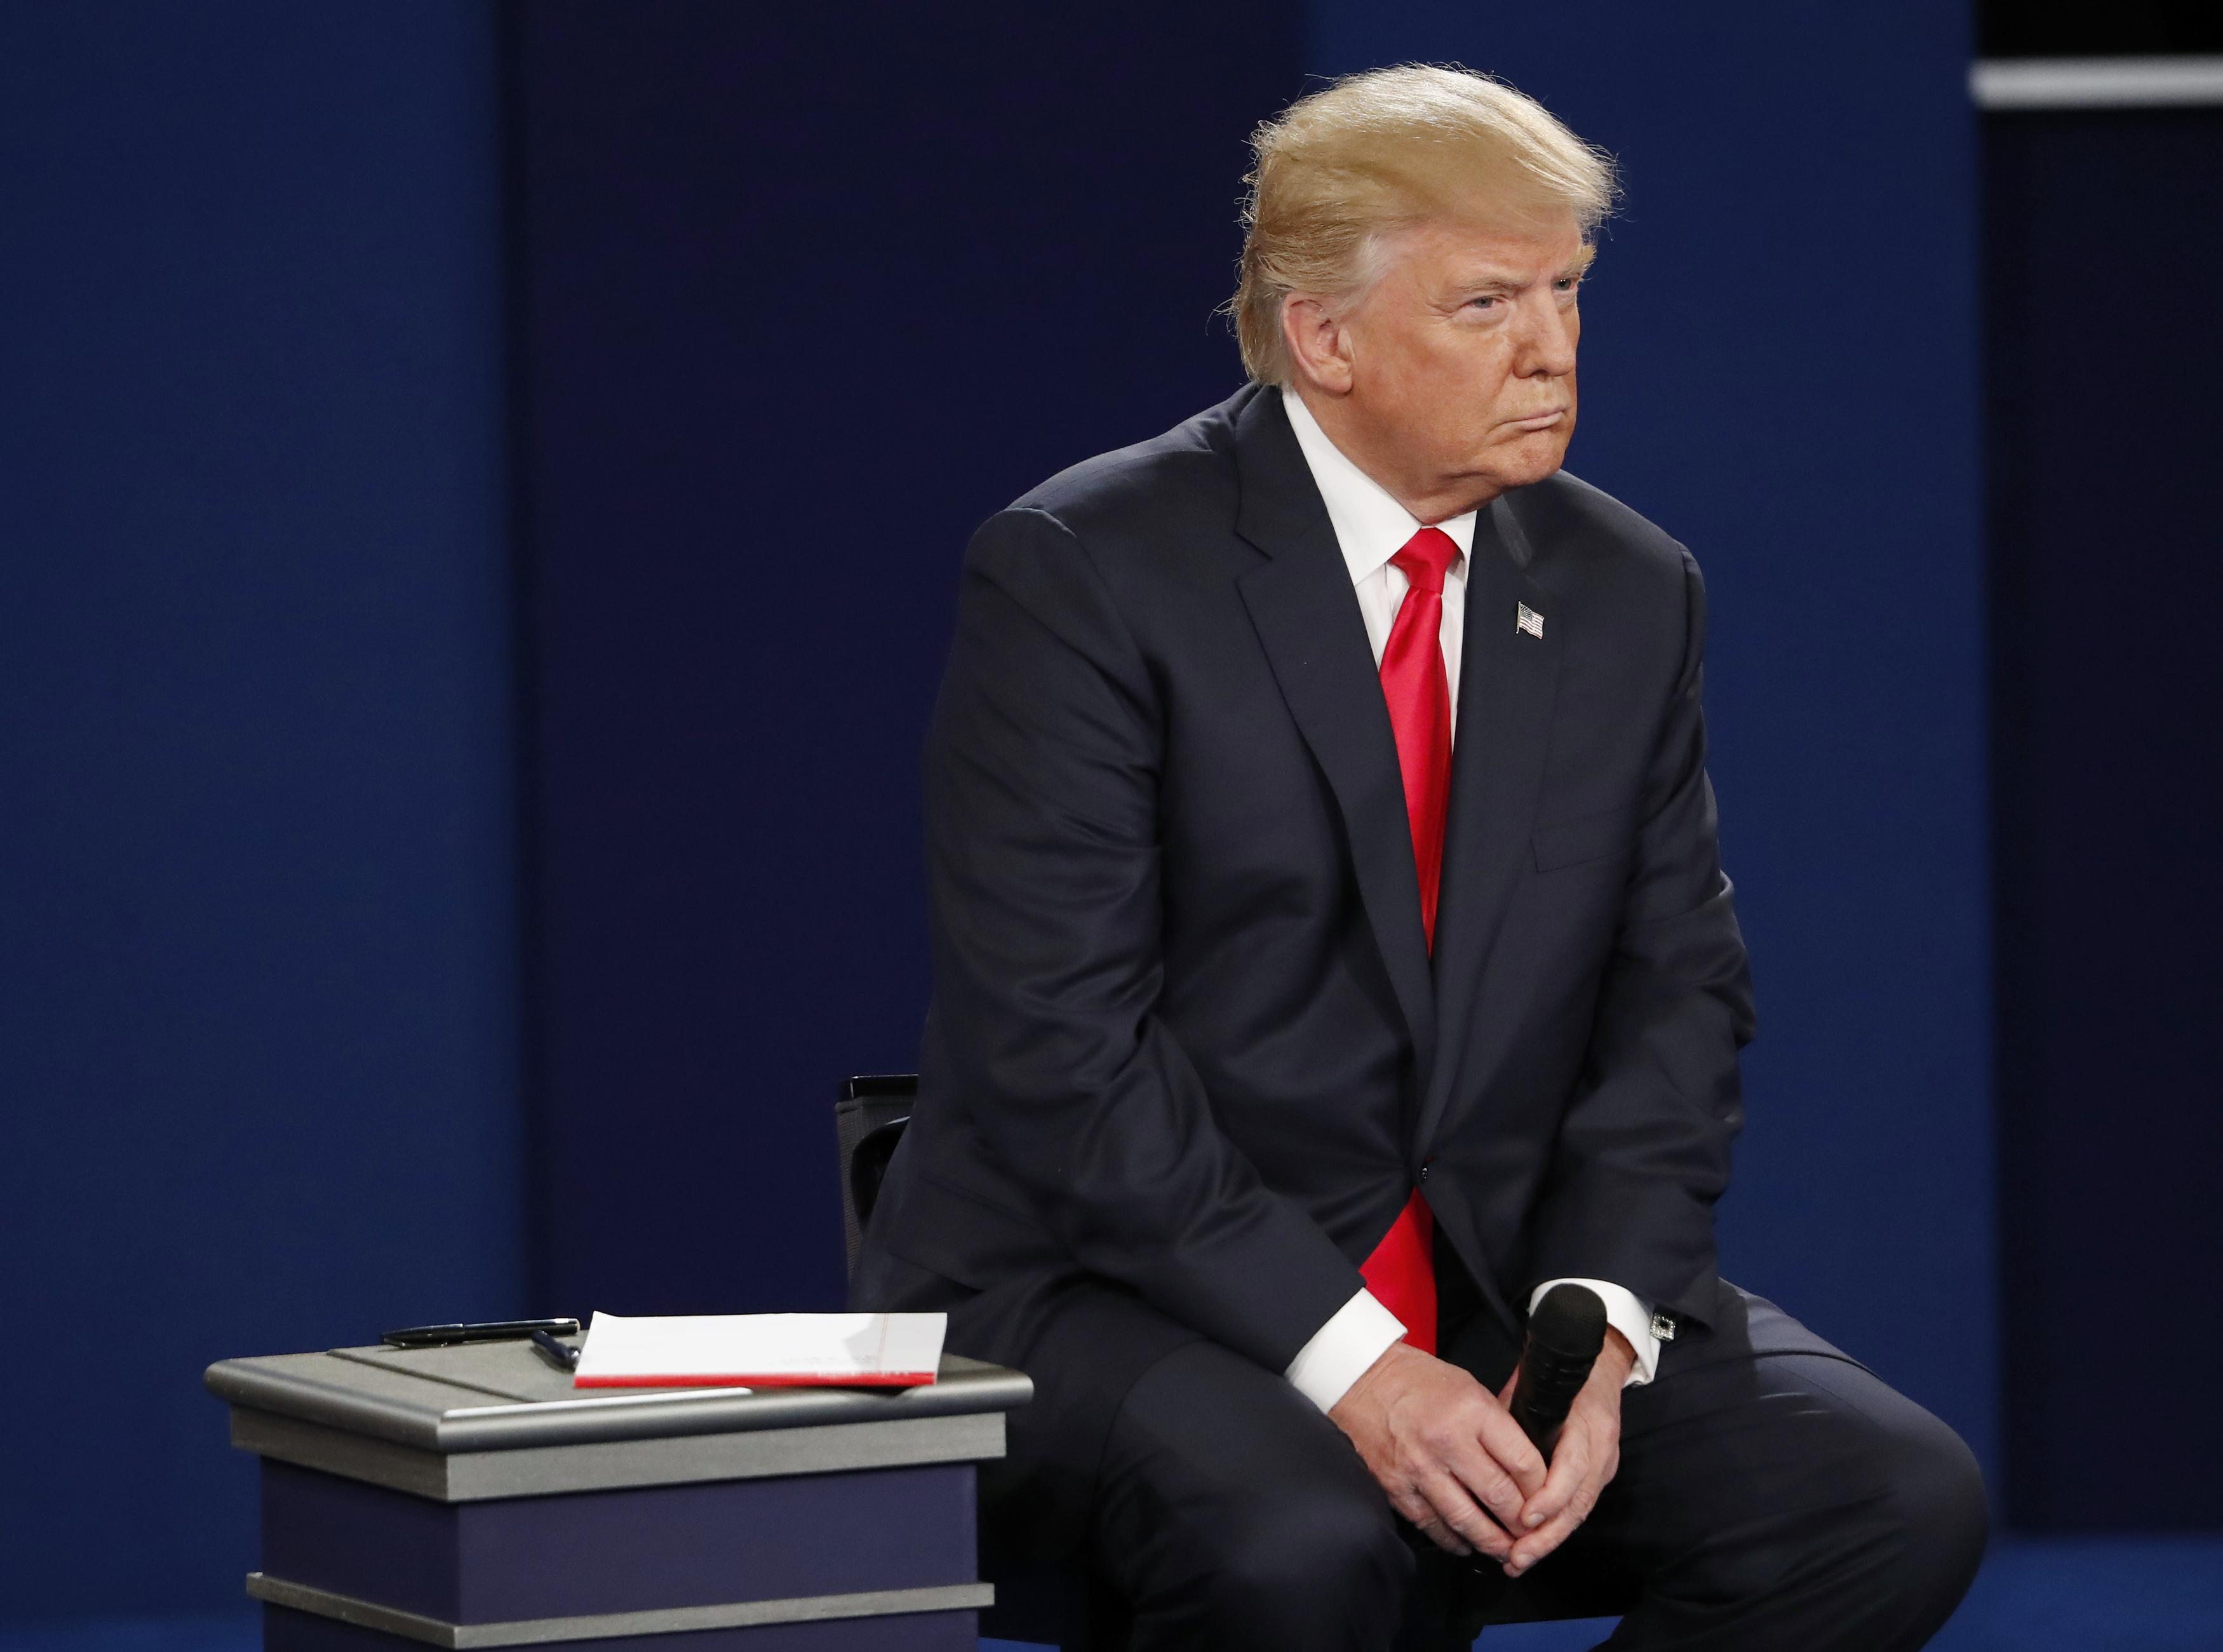 Republican U.S. presidential nominee Donald Trump listens during the second U.S. presidential town hall debate between Trump and Democratic U.S. presidential nominee Hillary Clinton at Washington University in St. Louis